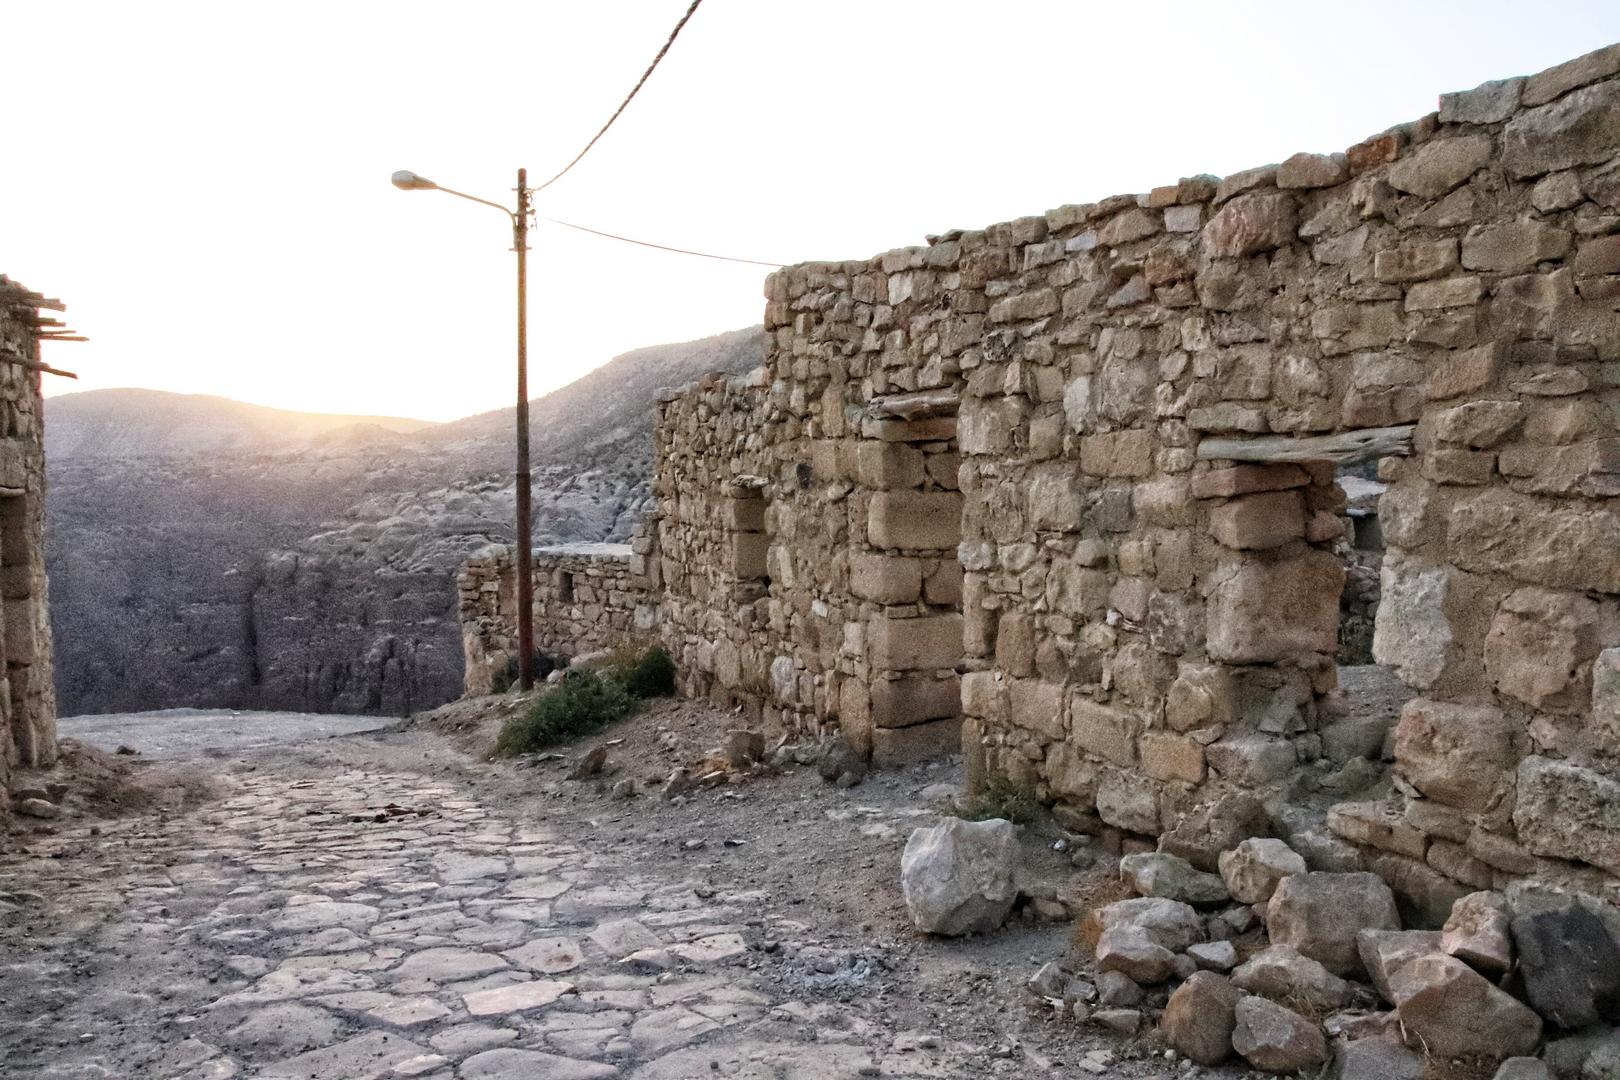 Jordanie - Petit village de Dana